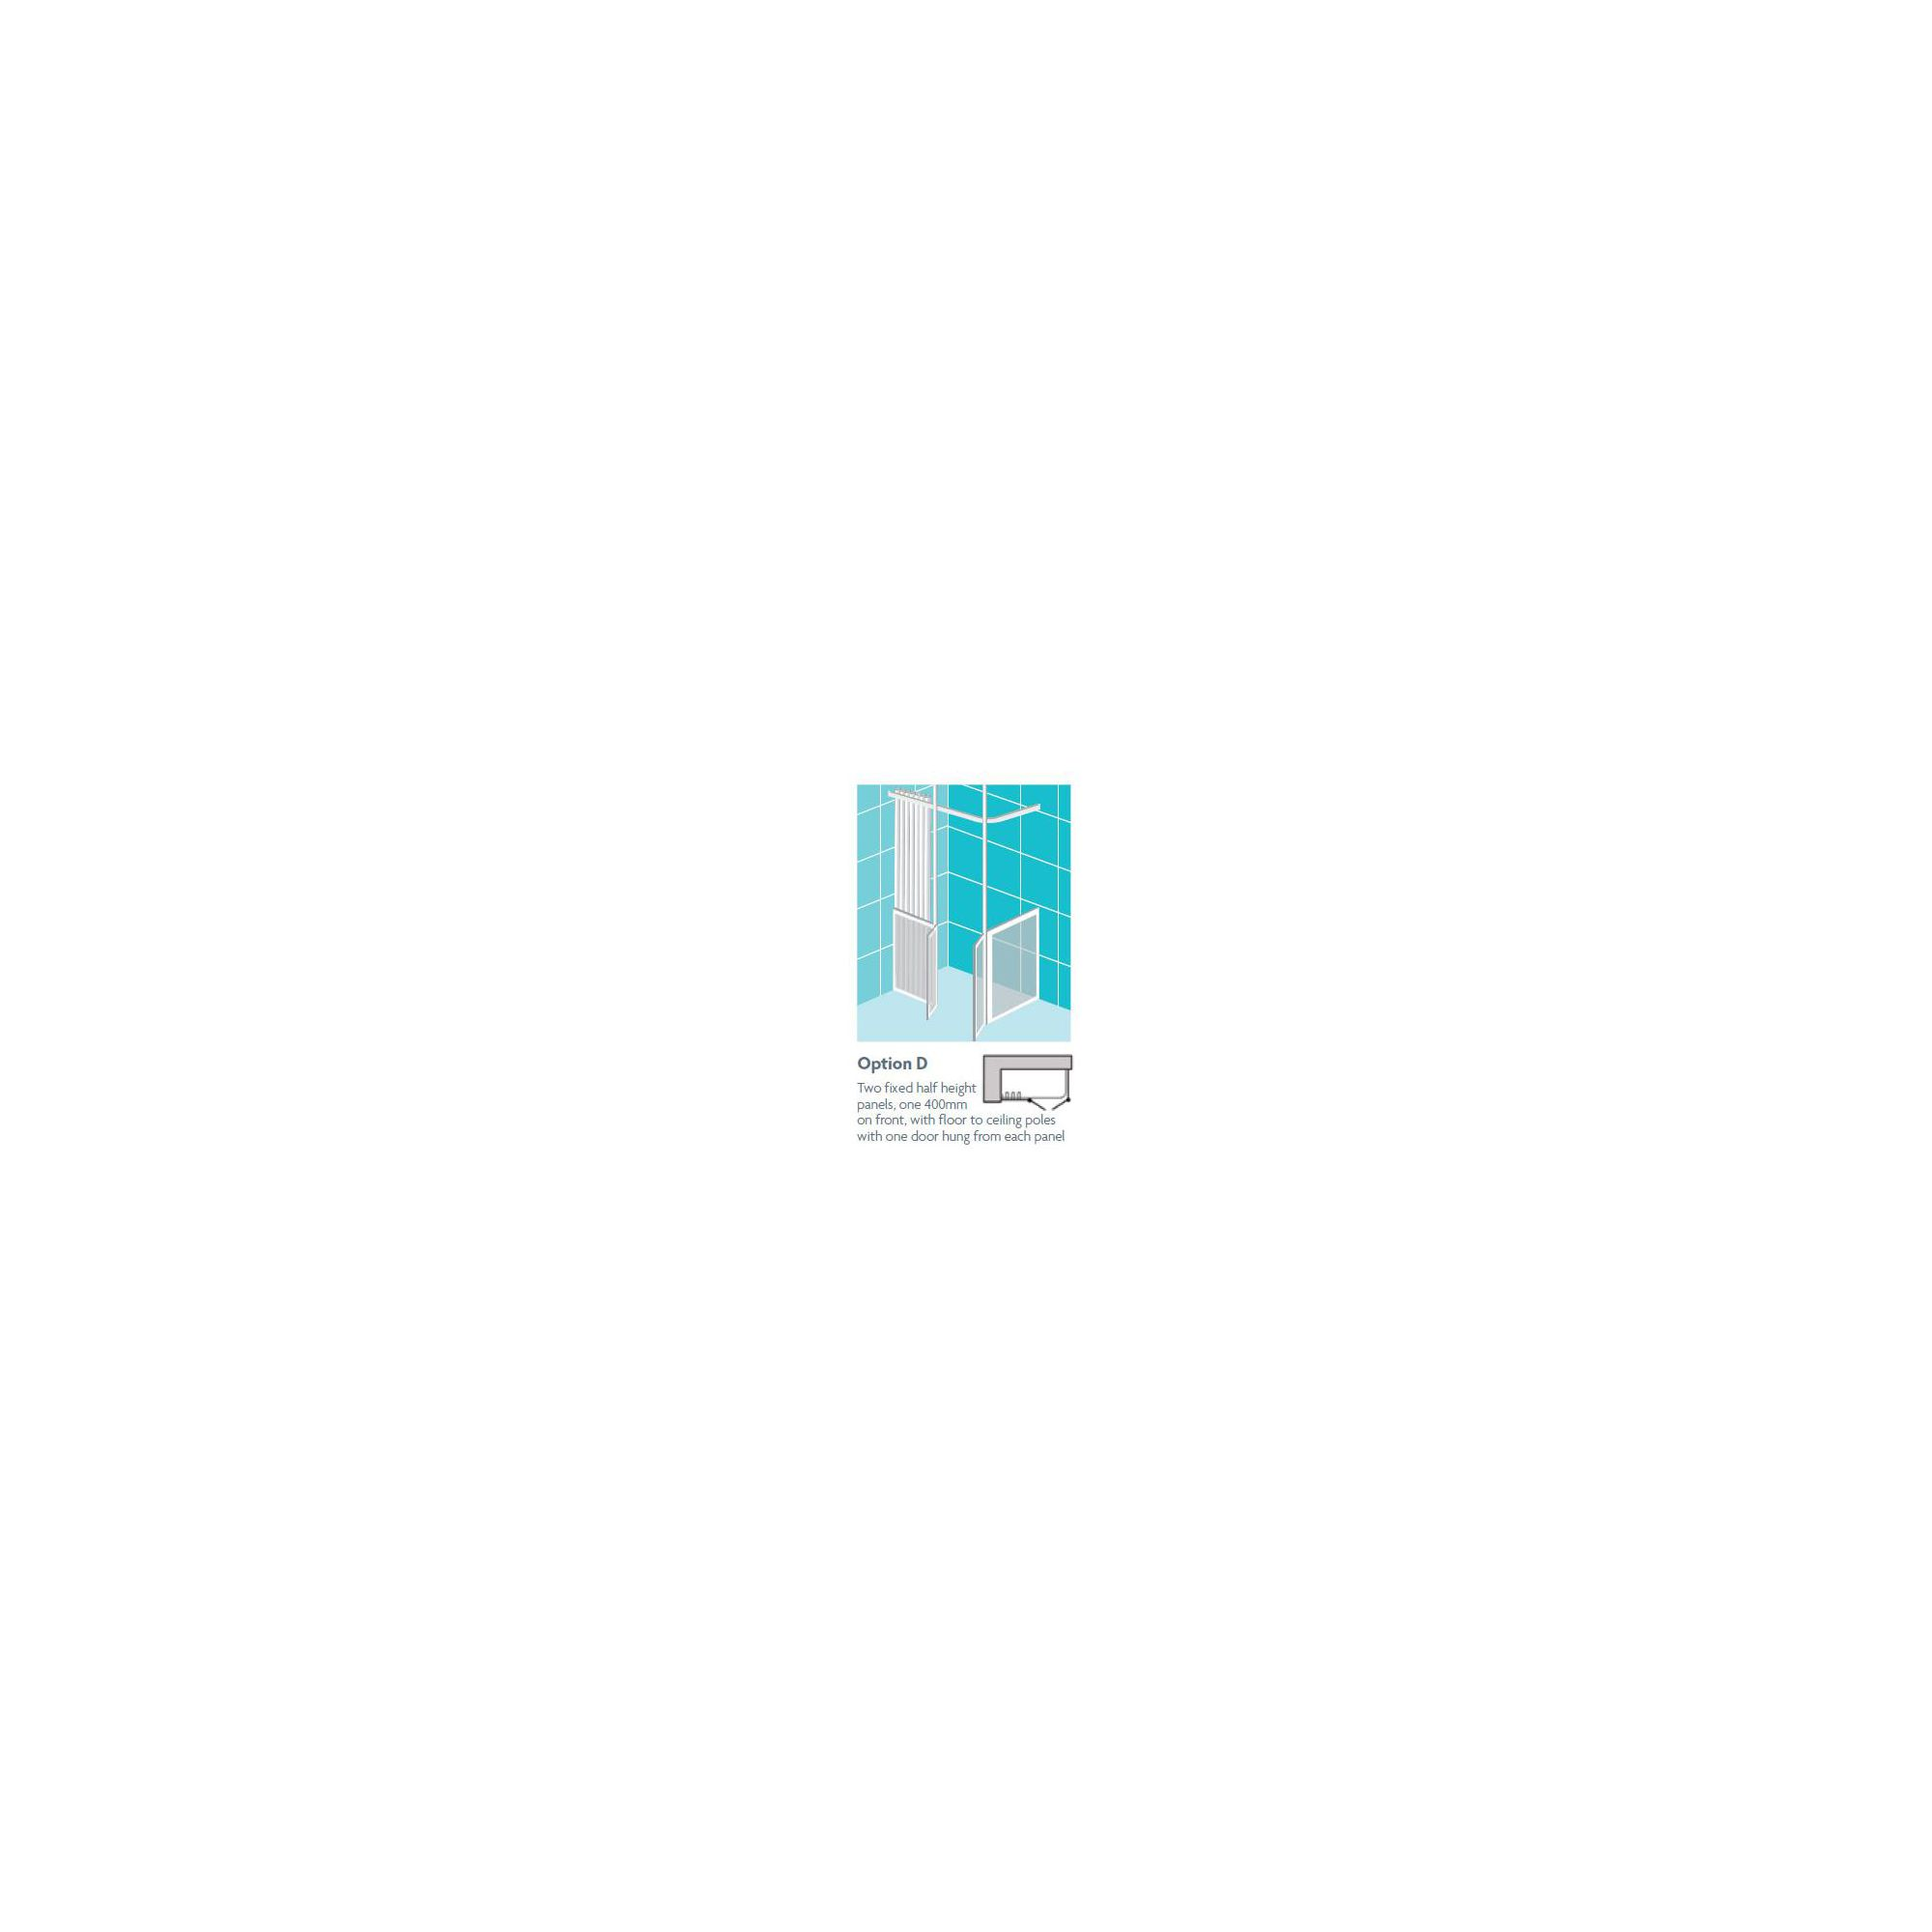 Impey Supreme Corner Door Option D Left Hand 1500mm x 800mm at Tescos Direct